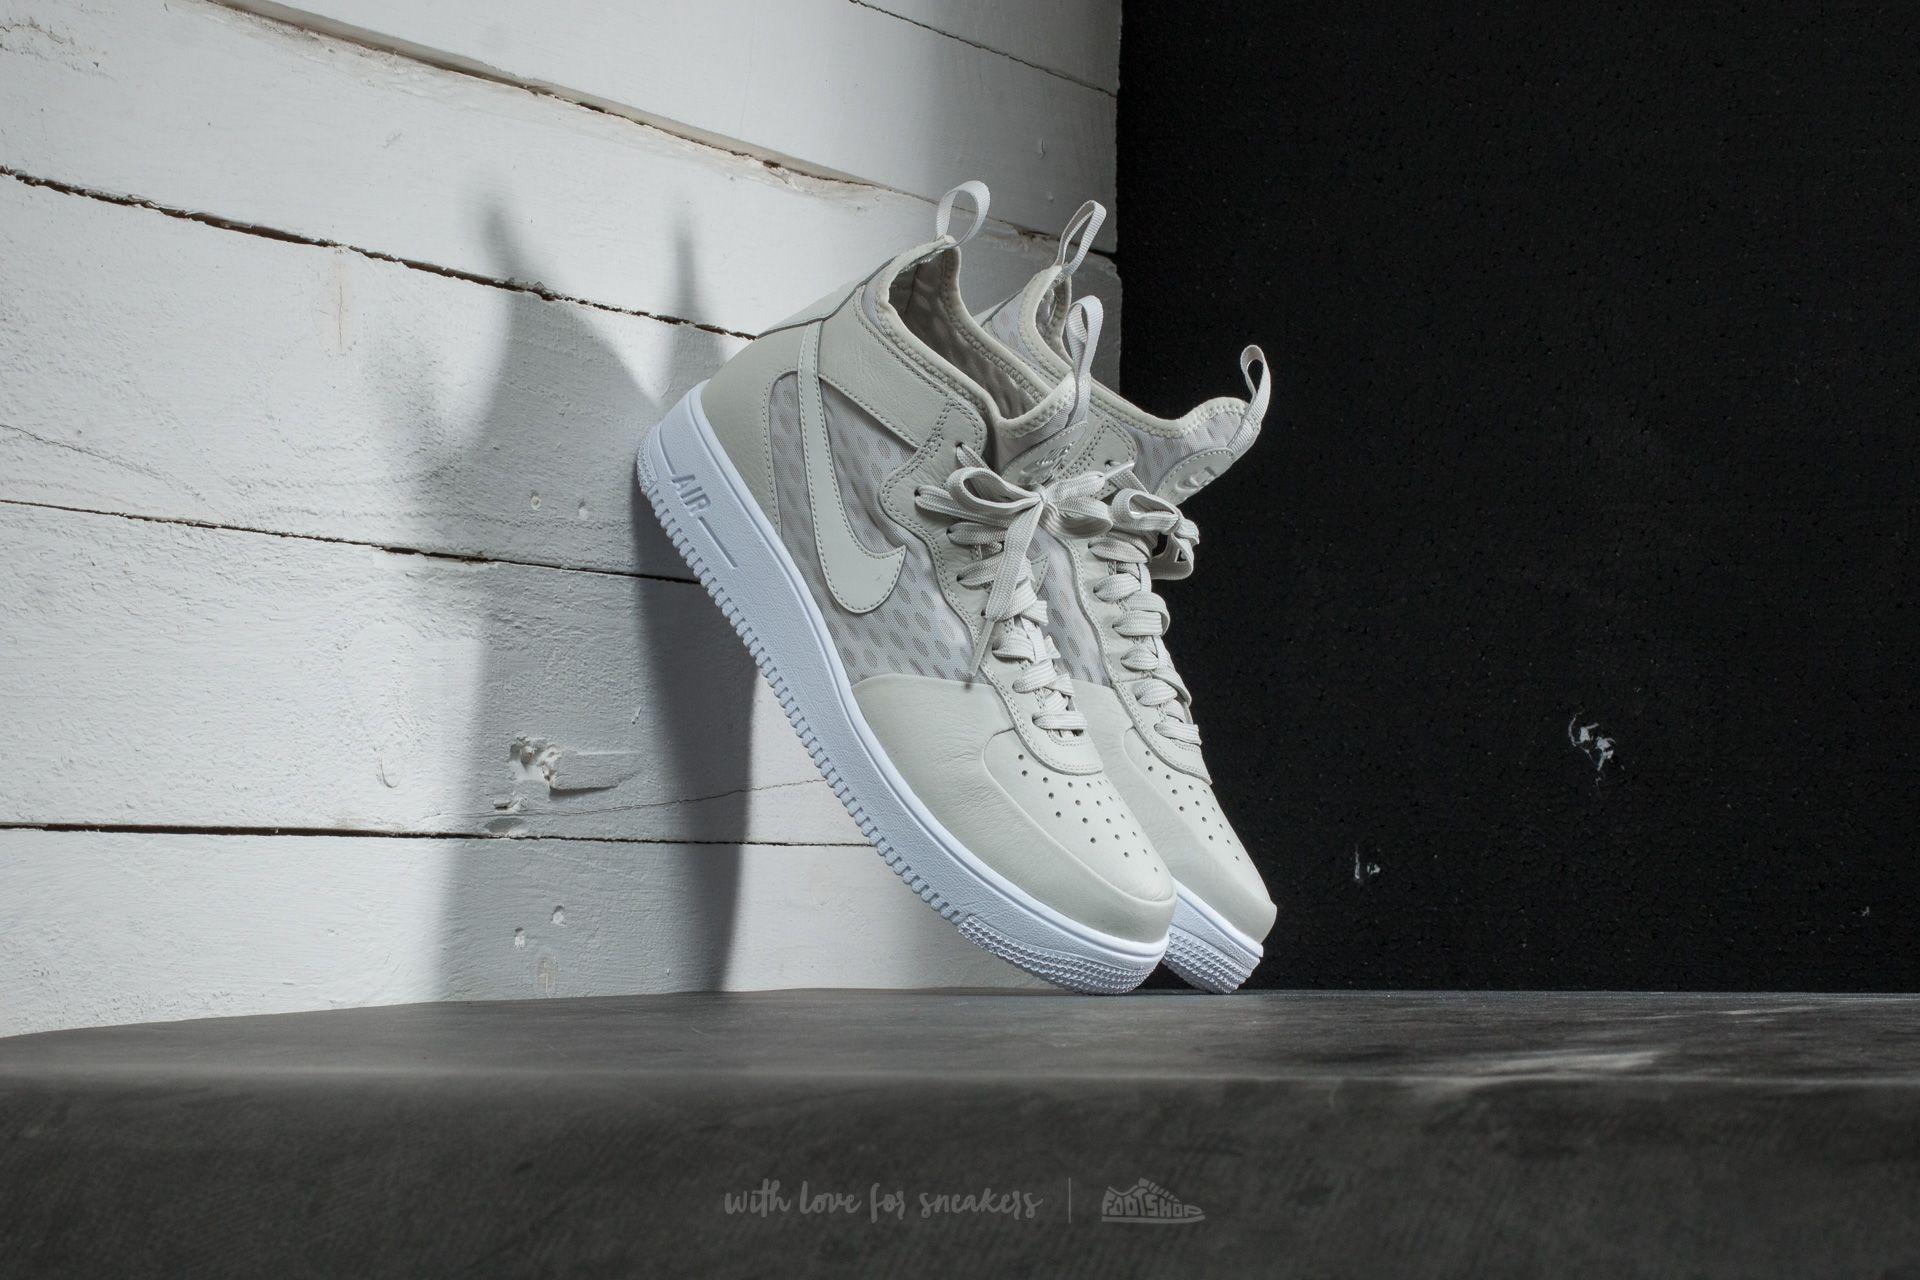 Nike Air Force 1 Mid 07 Uomo, Light Bone White White